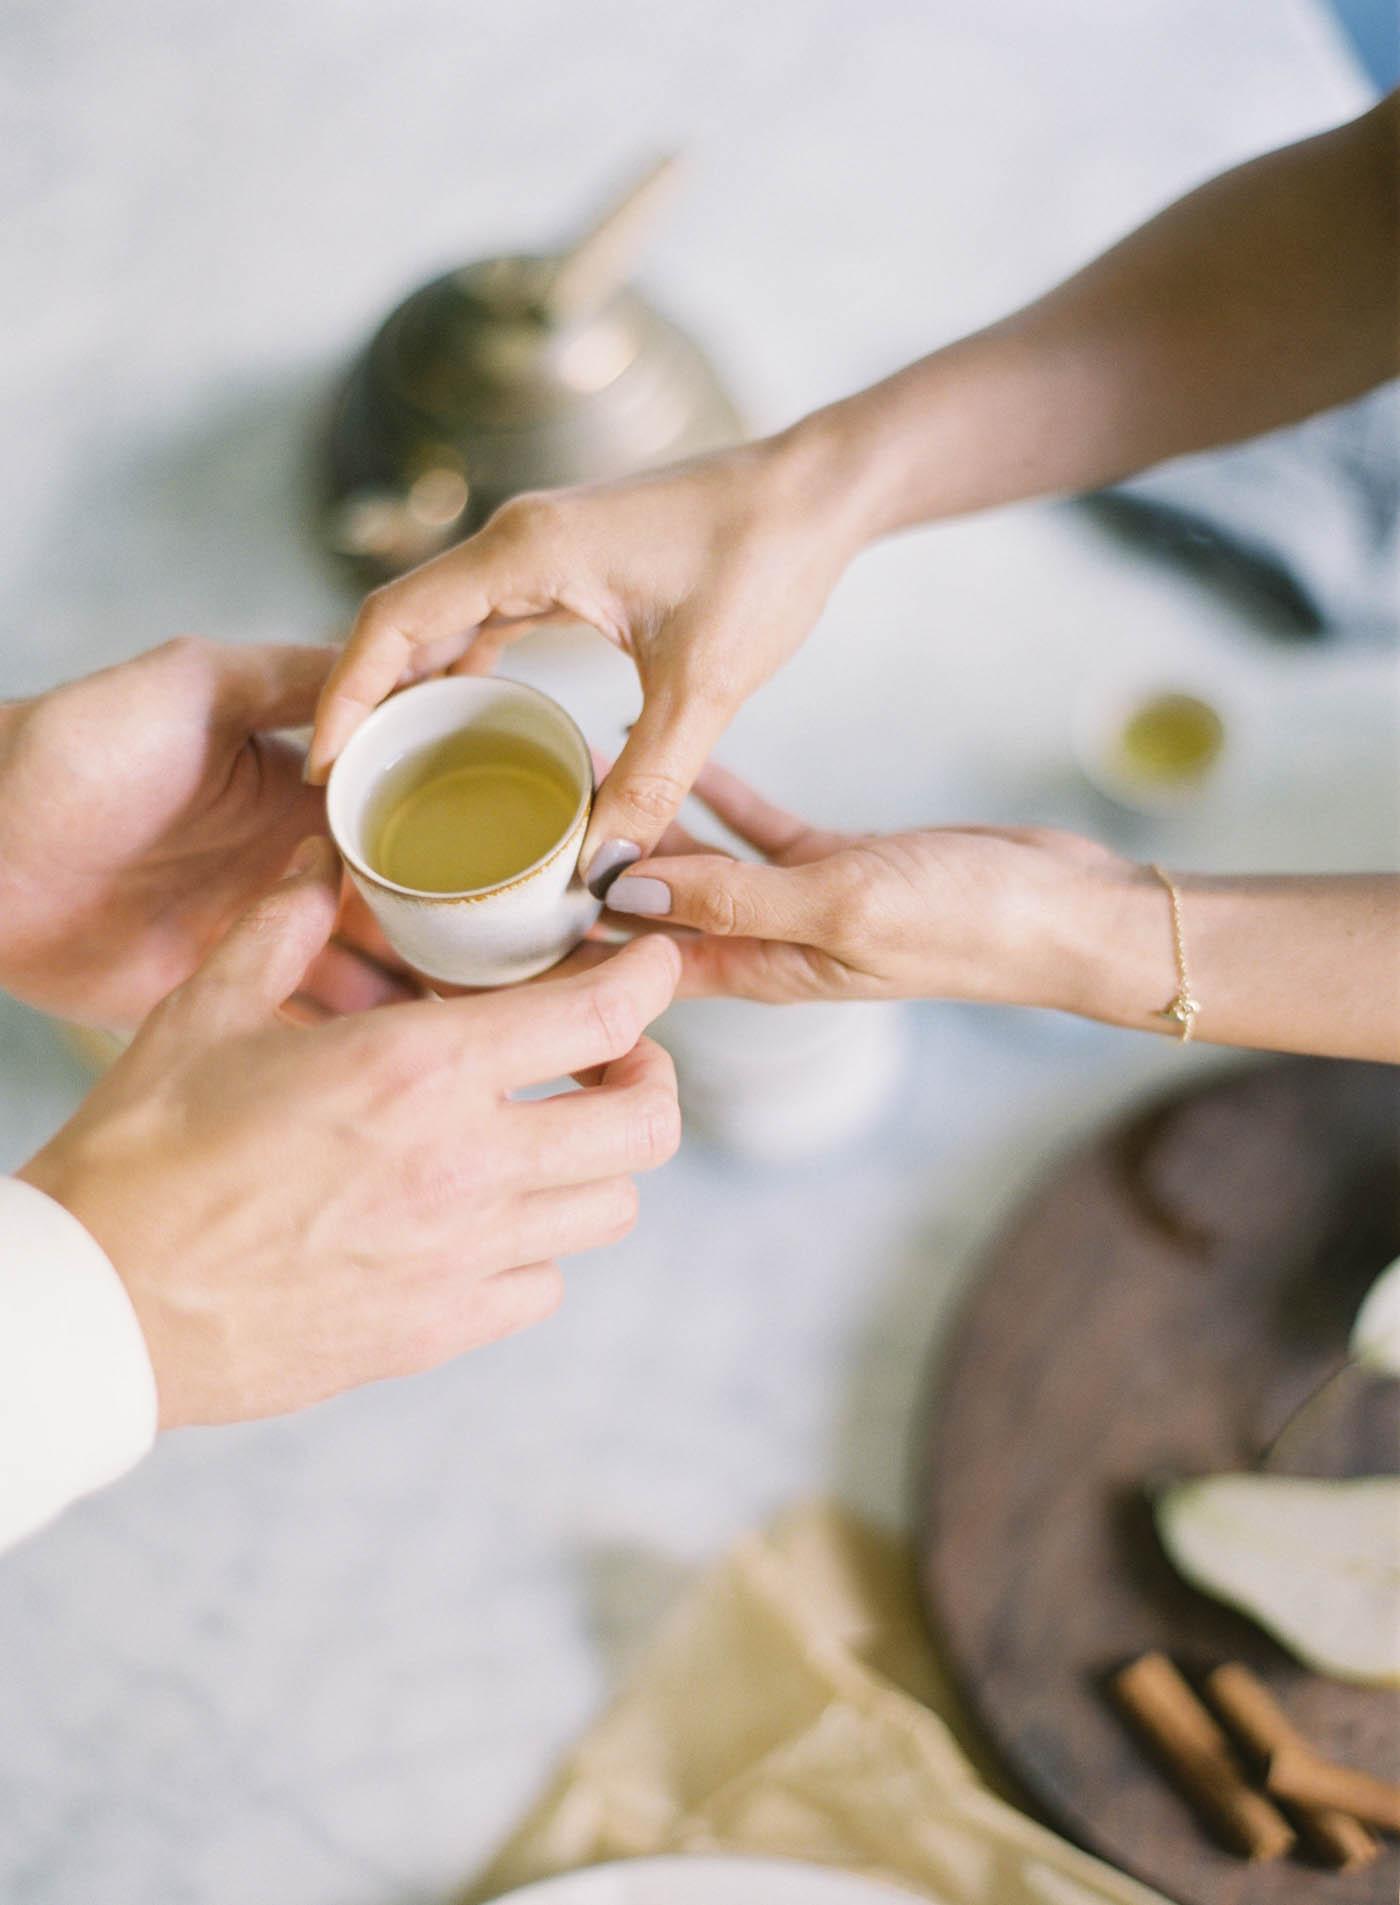 riviera-house-engagement-112-Jen_Huang-Tea-Ceremony-334-Jen_Huang-004143-R1-007.jpg